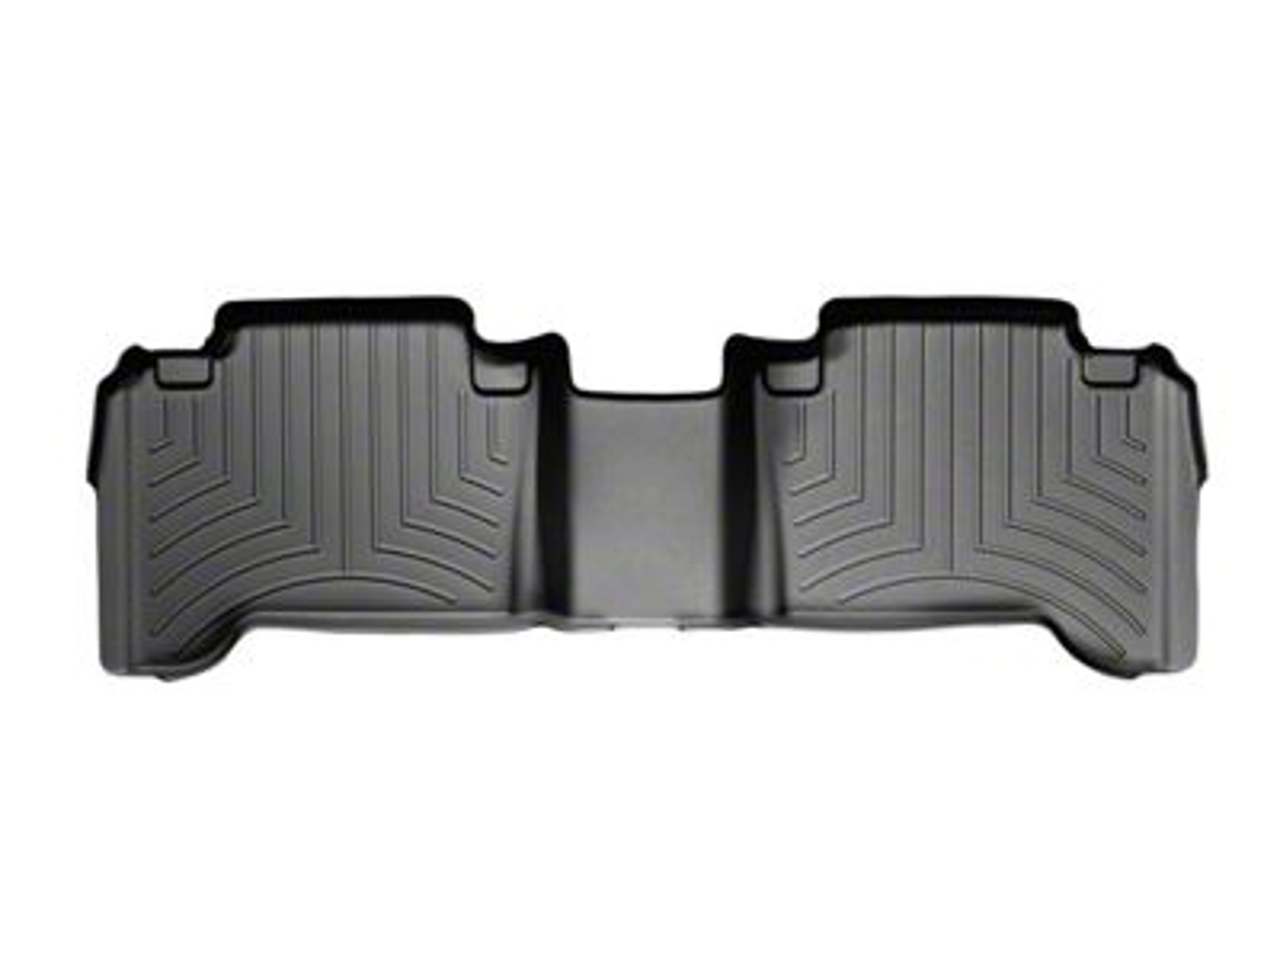 Weathertech DigitalFit Rear Floor Liner - Black (05-15 Tacoma Double Cab)